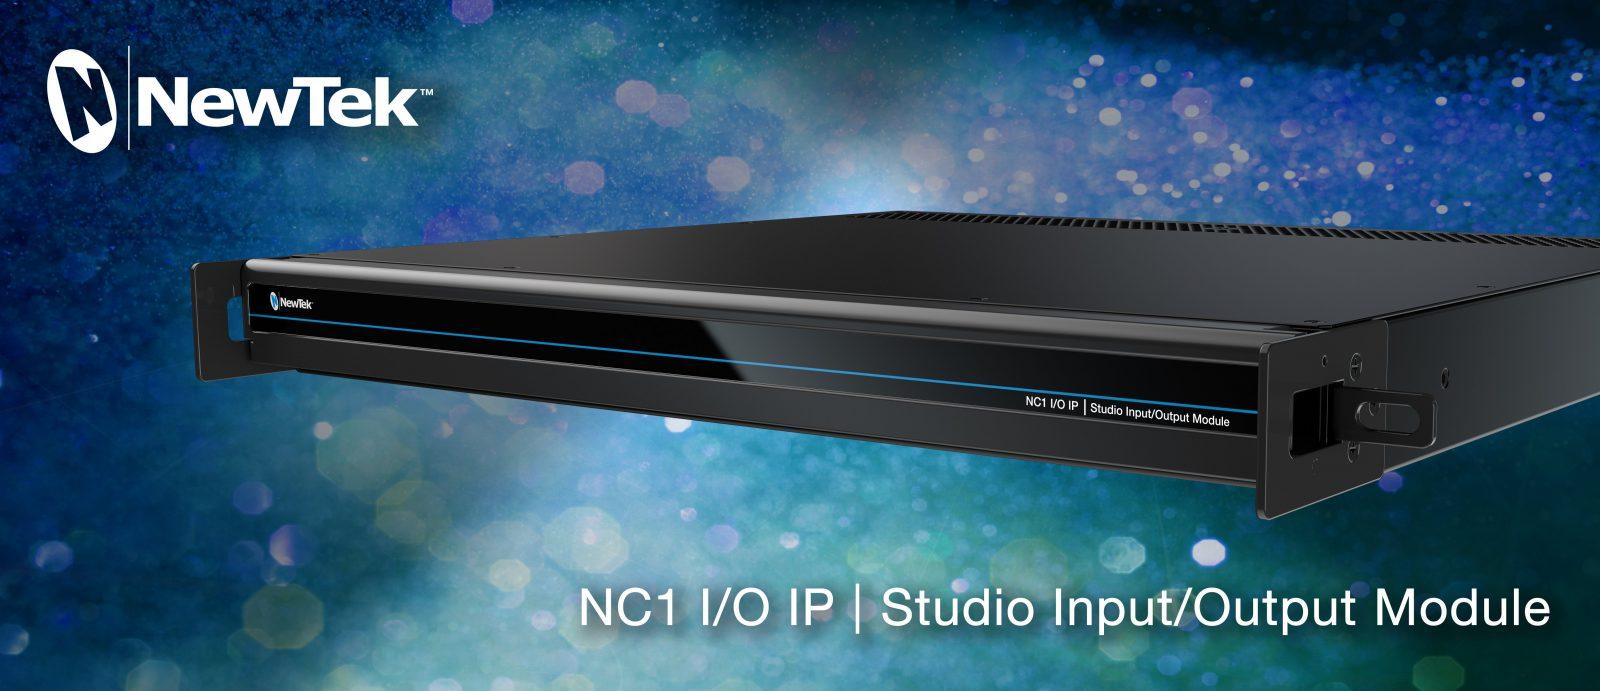 NewTek Studio NC1 I/O IP Header